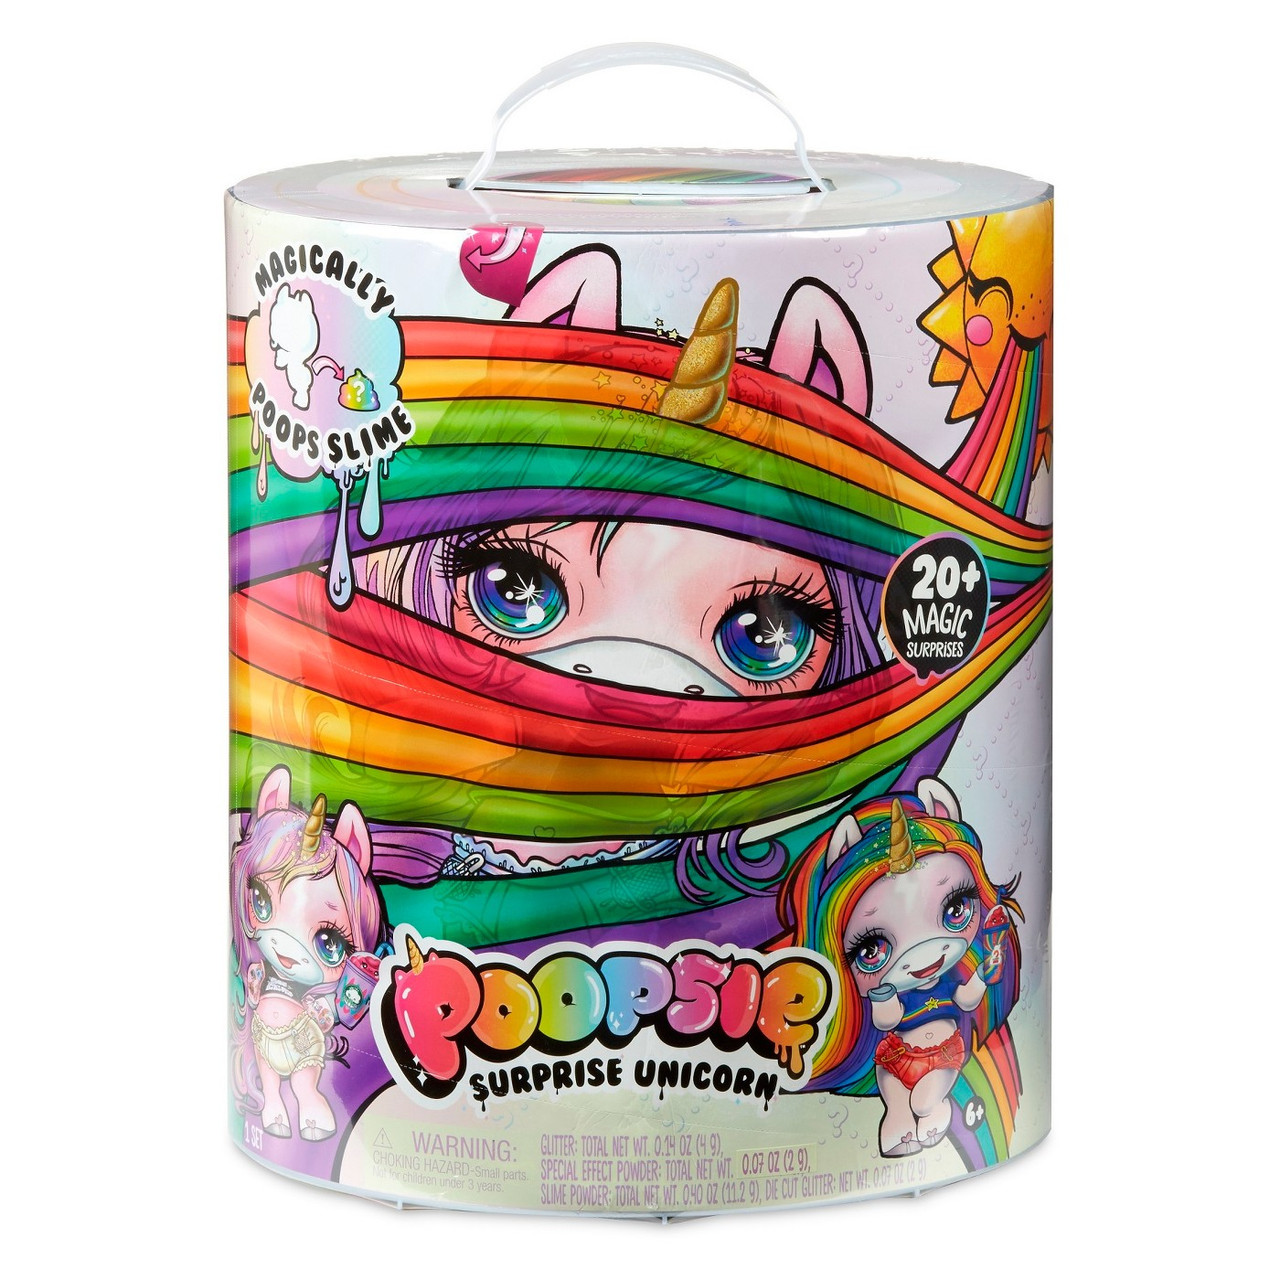 Оригинал MGA   Poopsie Slime Unicorn Surprise - Единорог (с золотым рогом)   555964